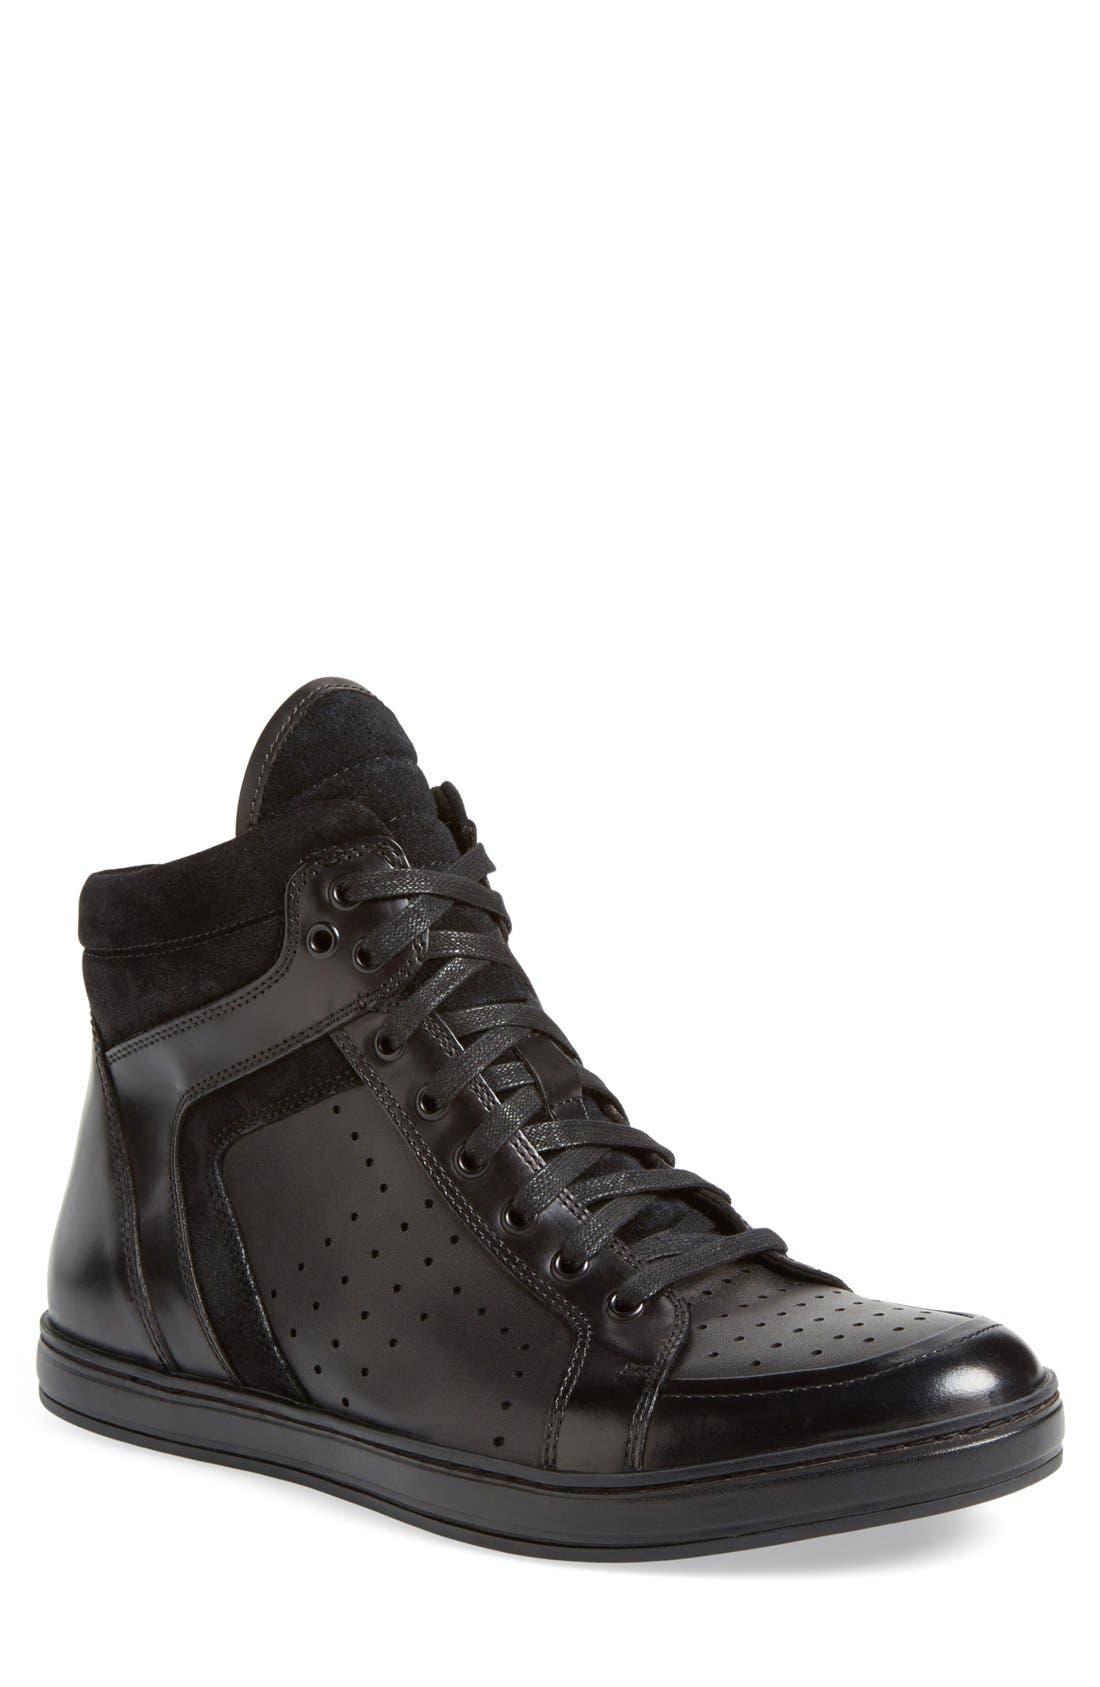 Alternate Image 1 Selected - Kenneth Cole New York 'Big Brand' Sneaker (Men)